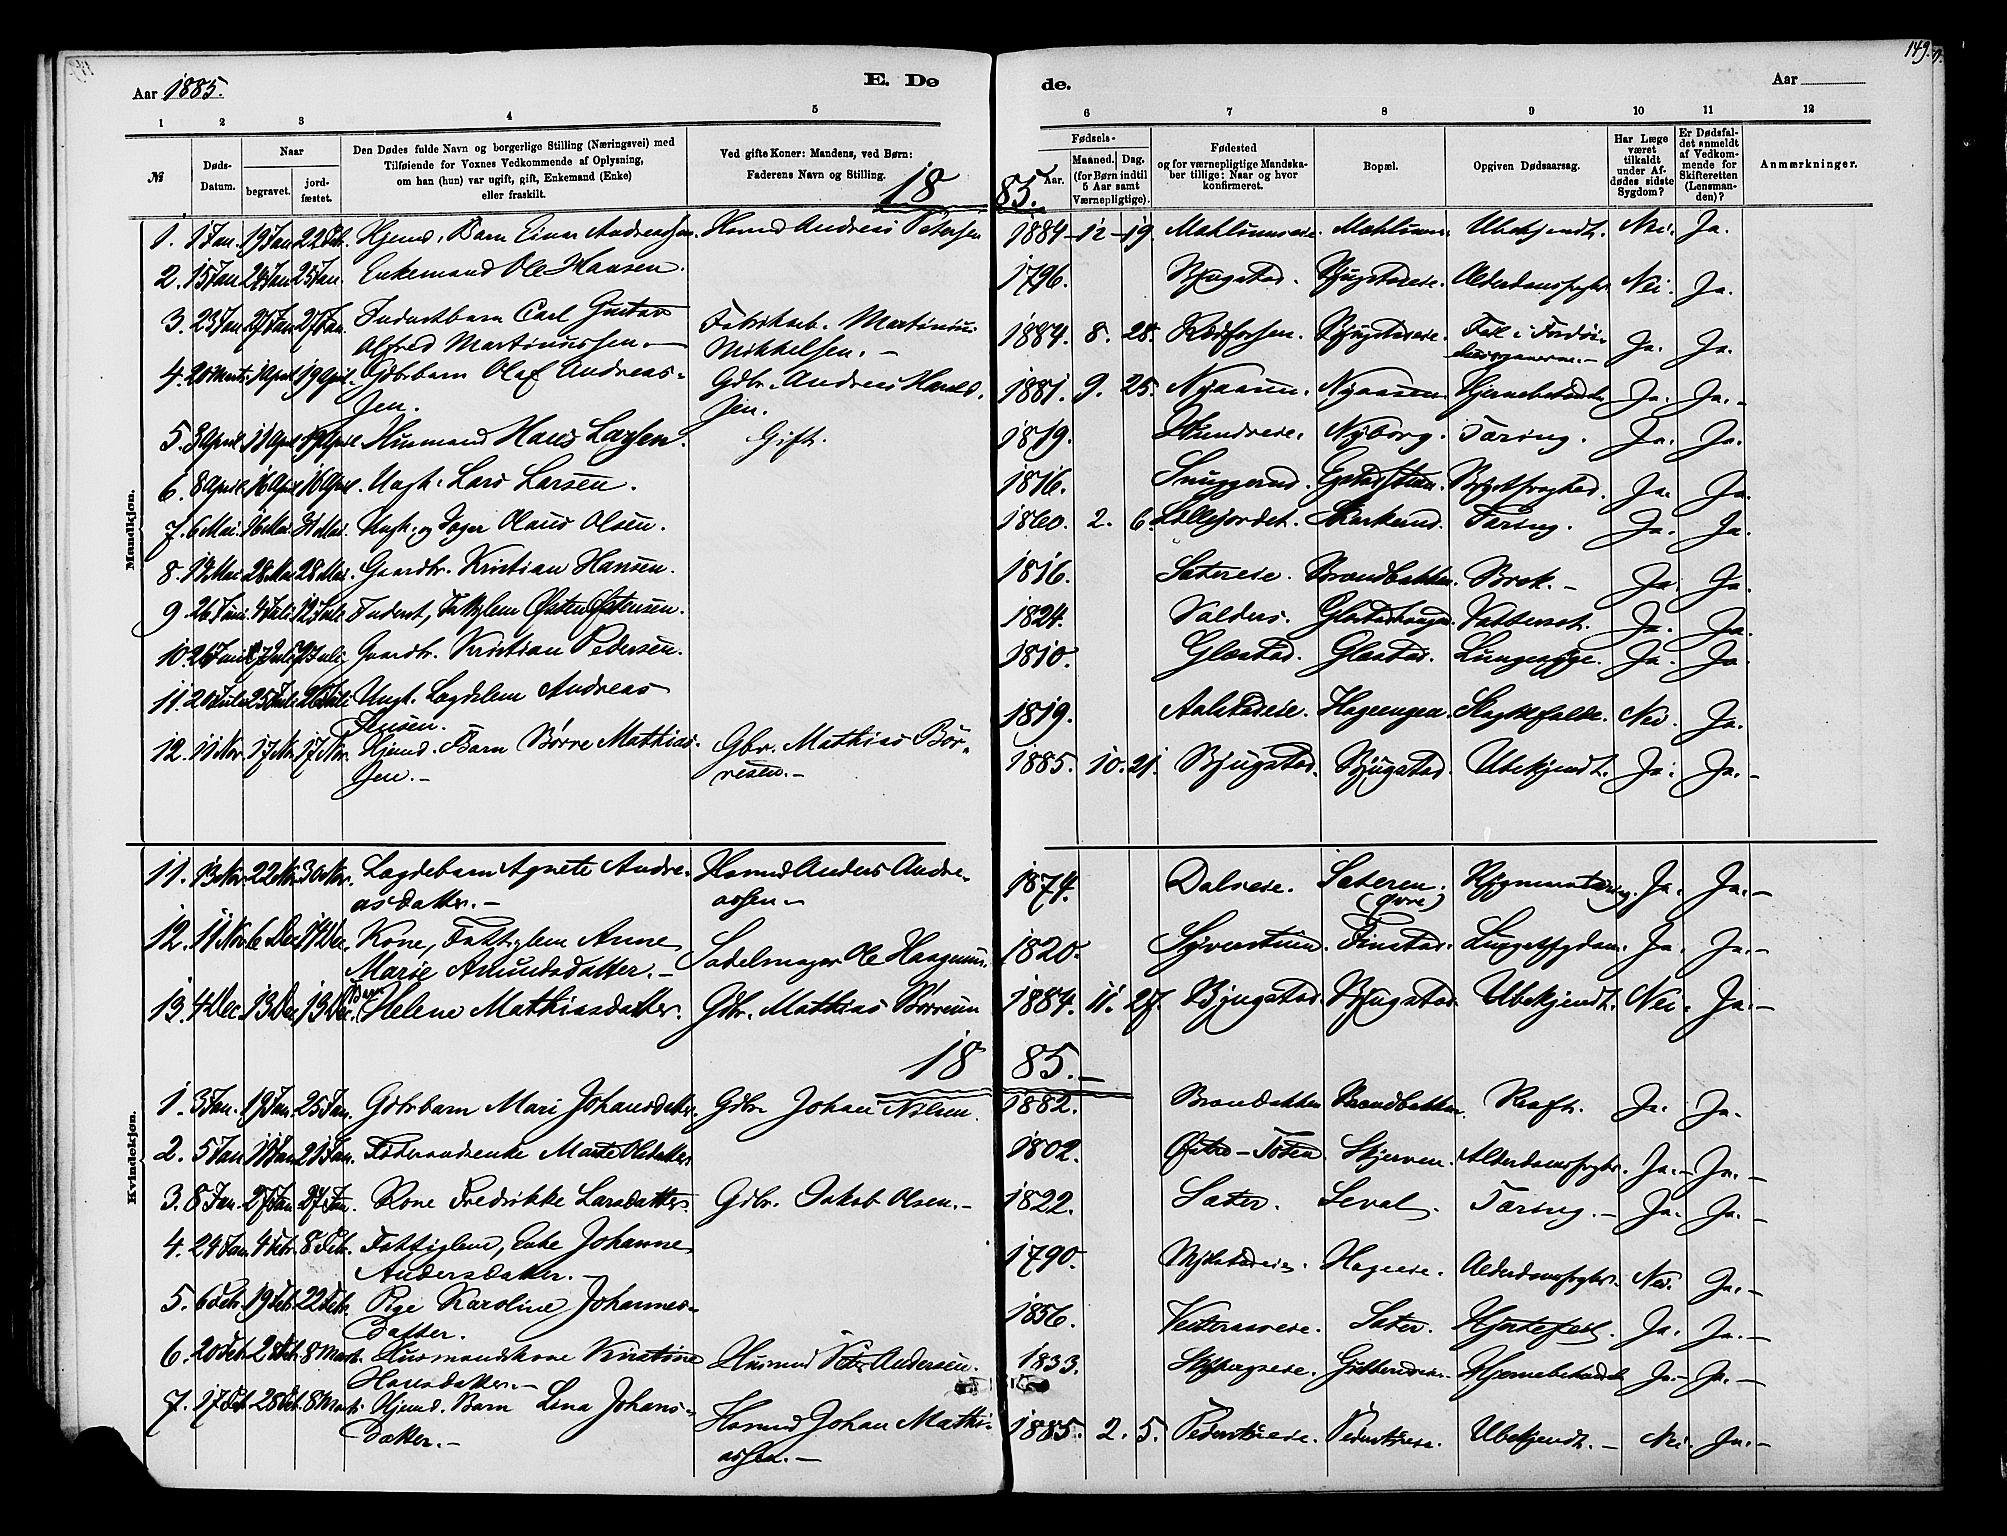 SAH, Vardal prestekontor, H/Ha/Haa/L0010: Ministerialbok nr. 10, 1878-1893, s. 149